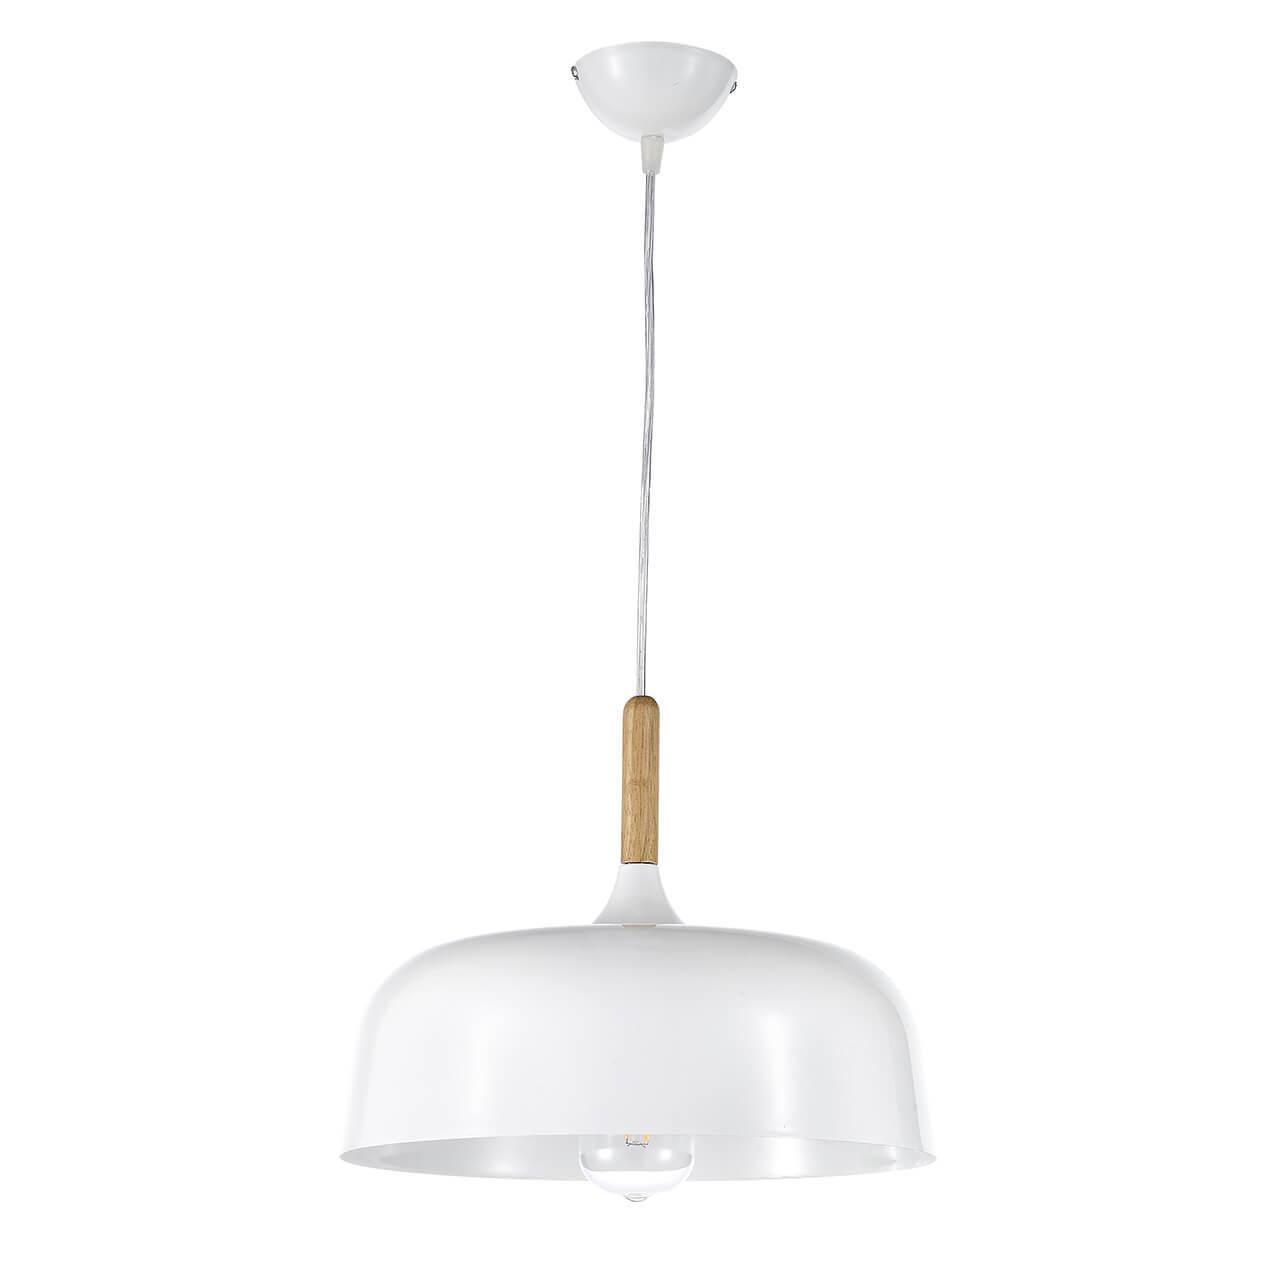 Подвесной светильник Arti Lampadari Nicolo E 1.3.P1 W arti lampadari подвесной светильник arti lampadari nicolo e 1 3 p1 w